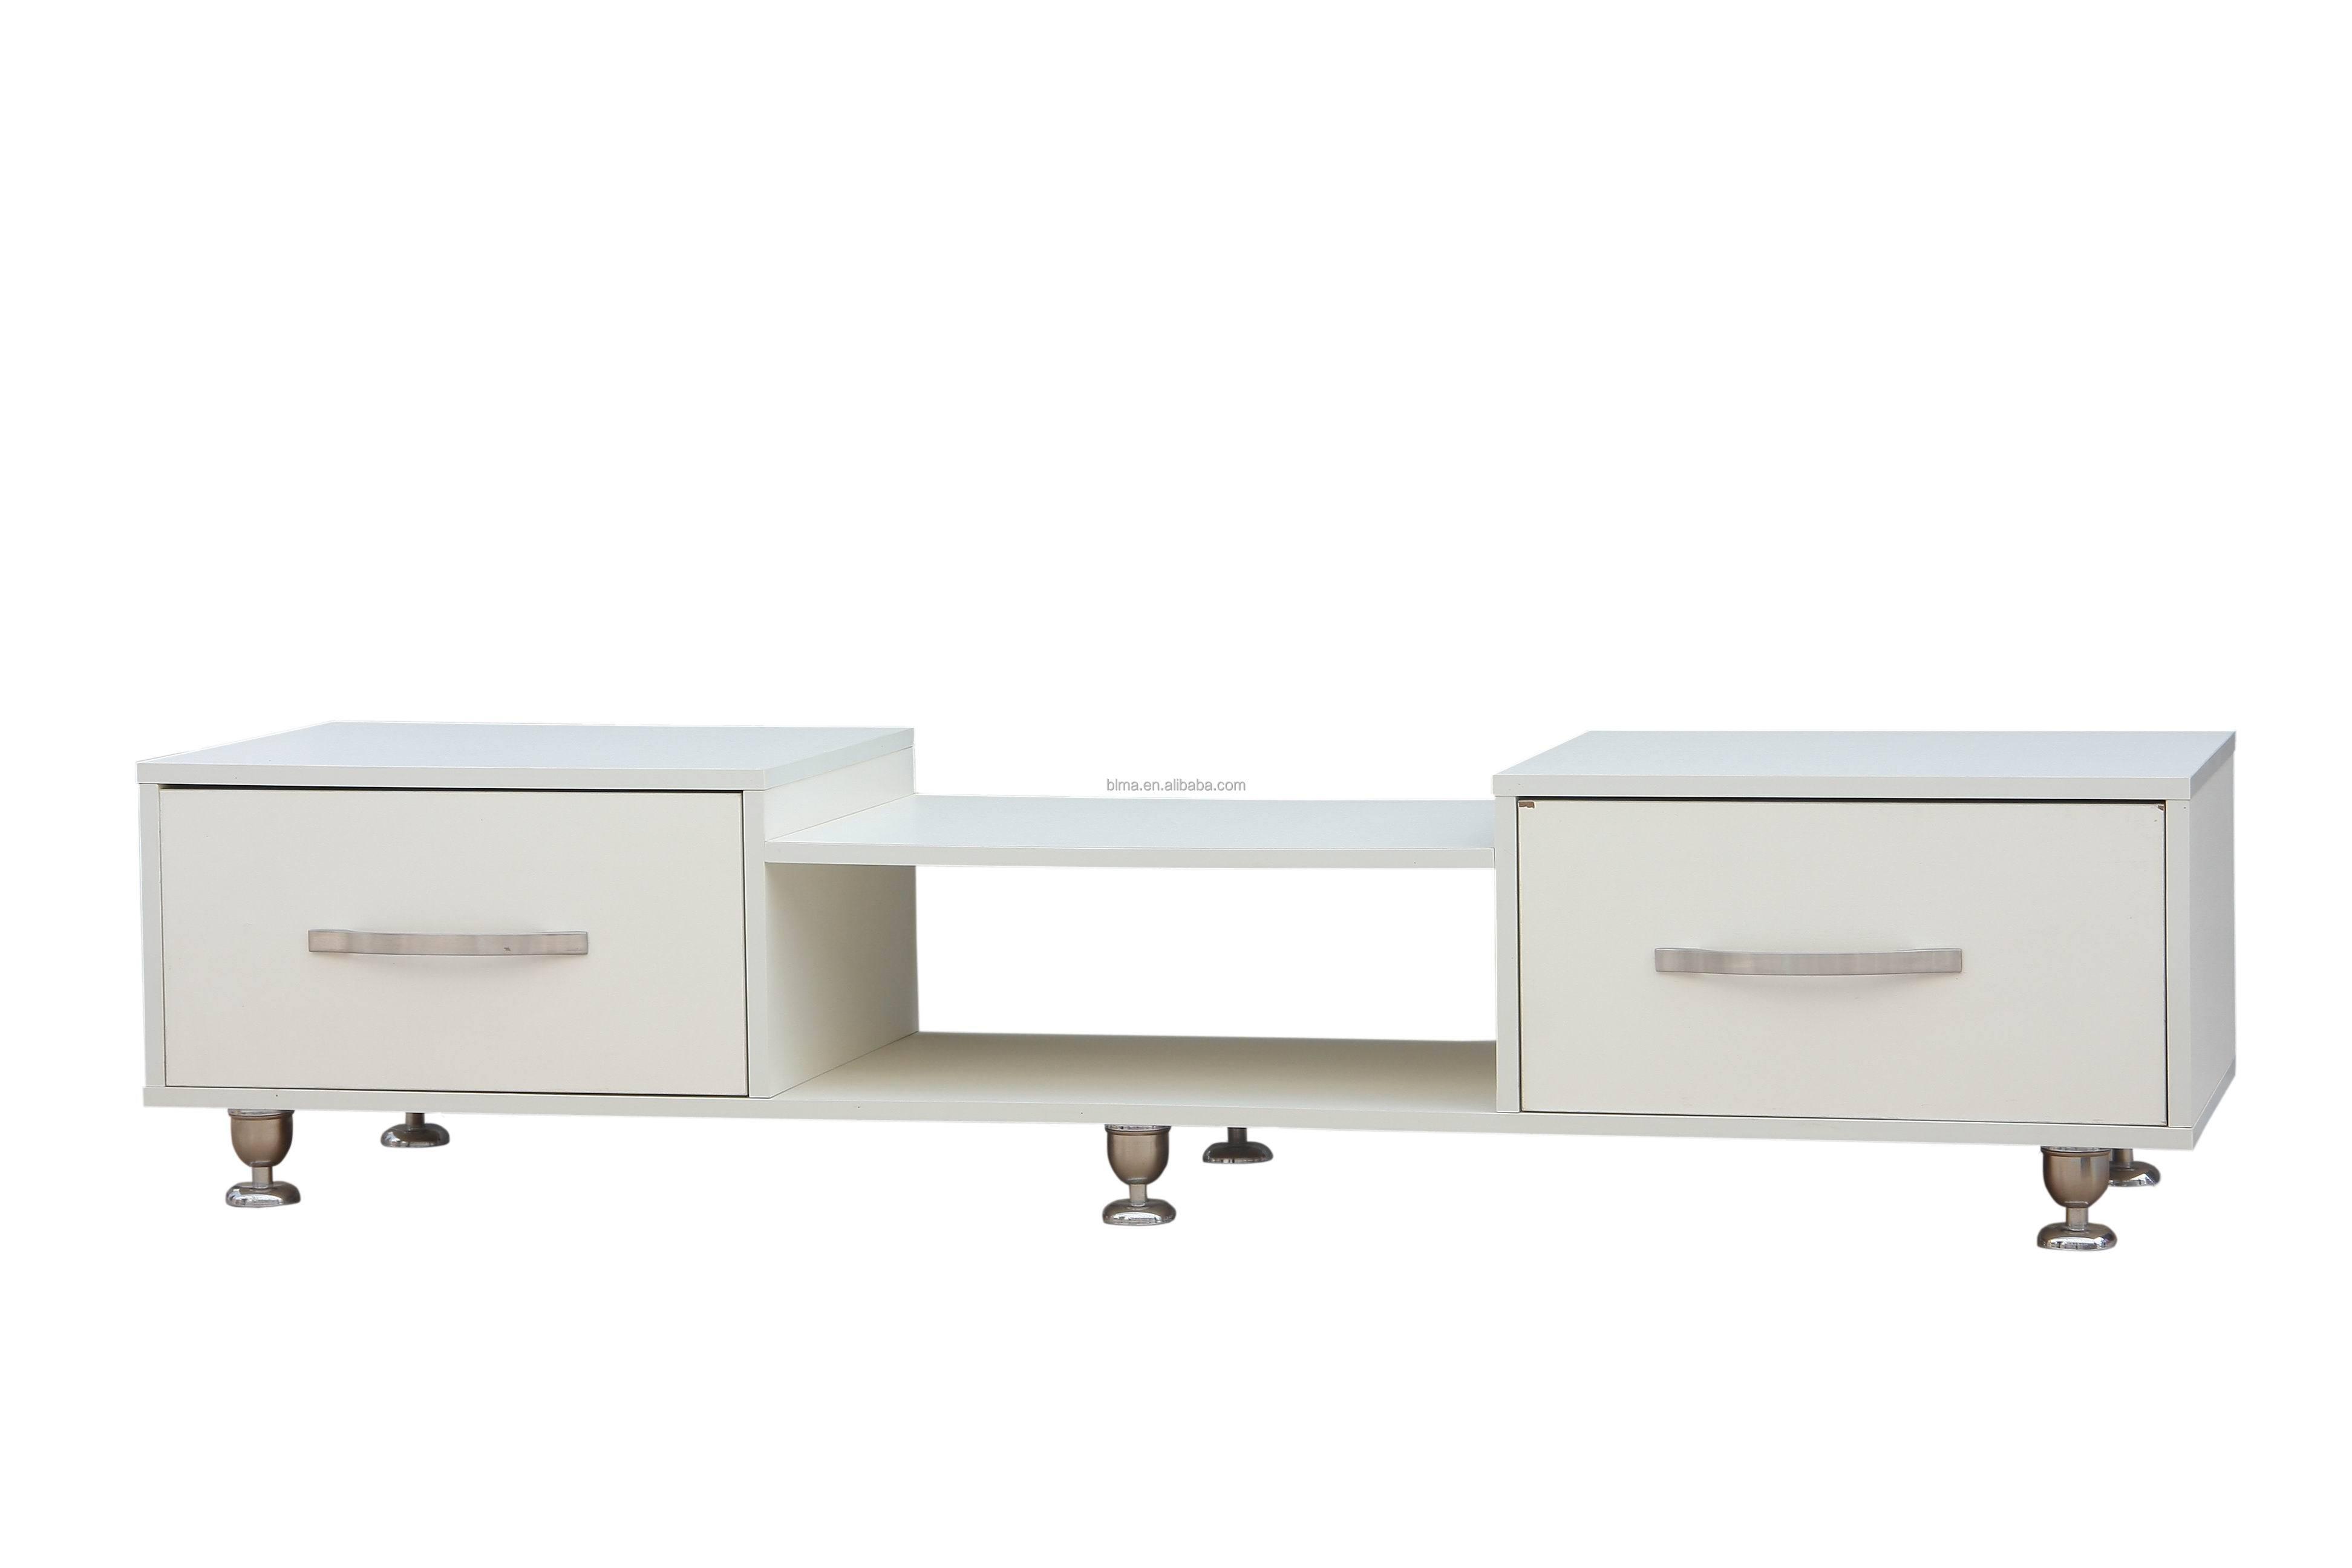 particle board mdf material wall tv cabinet design buy. Black Bedroom Furniture Sets. Home Design Ideas